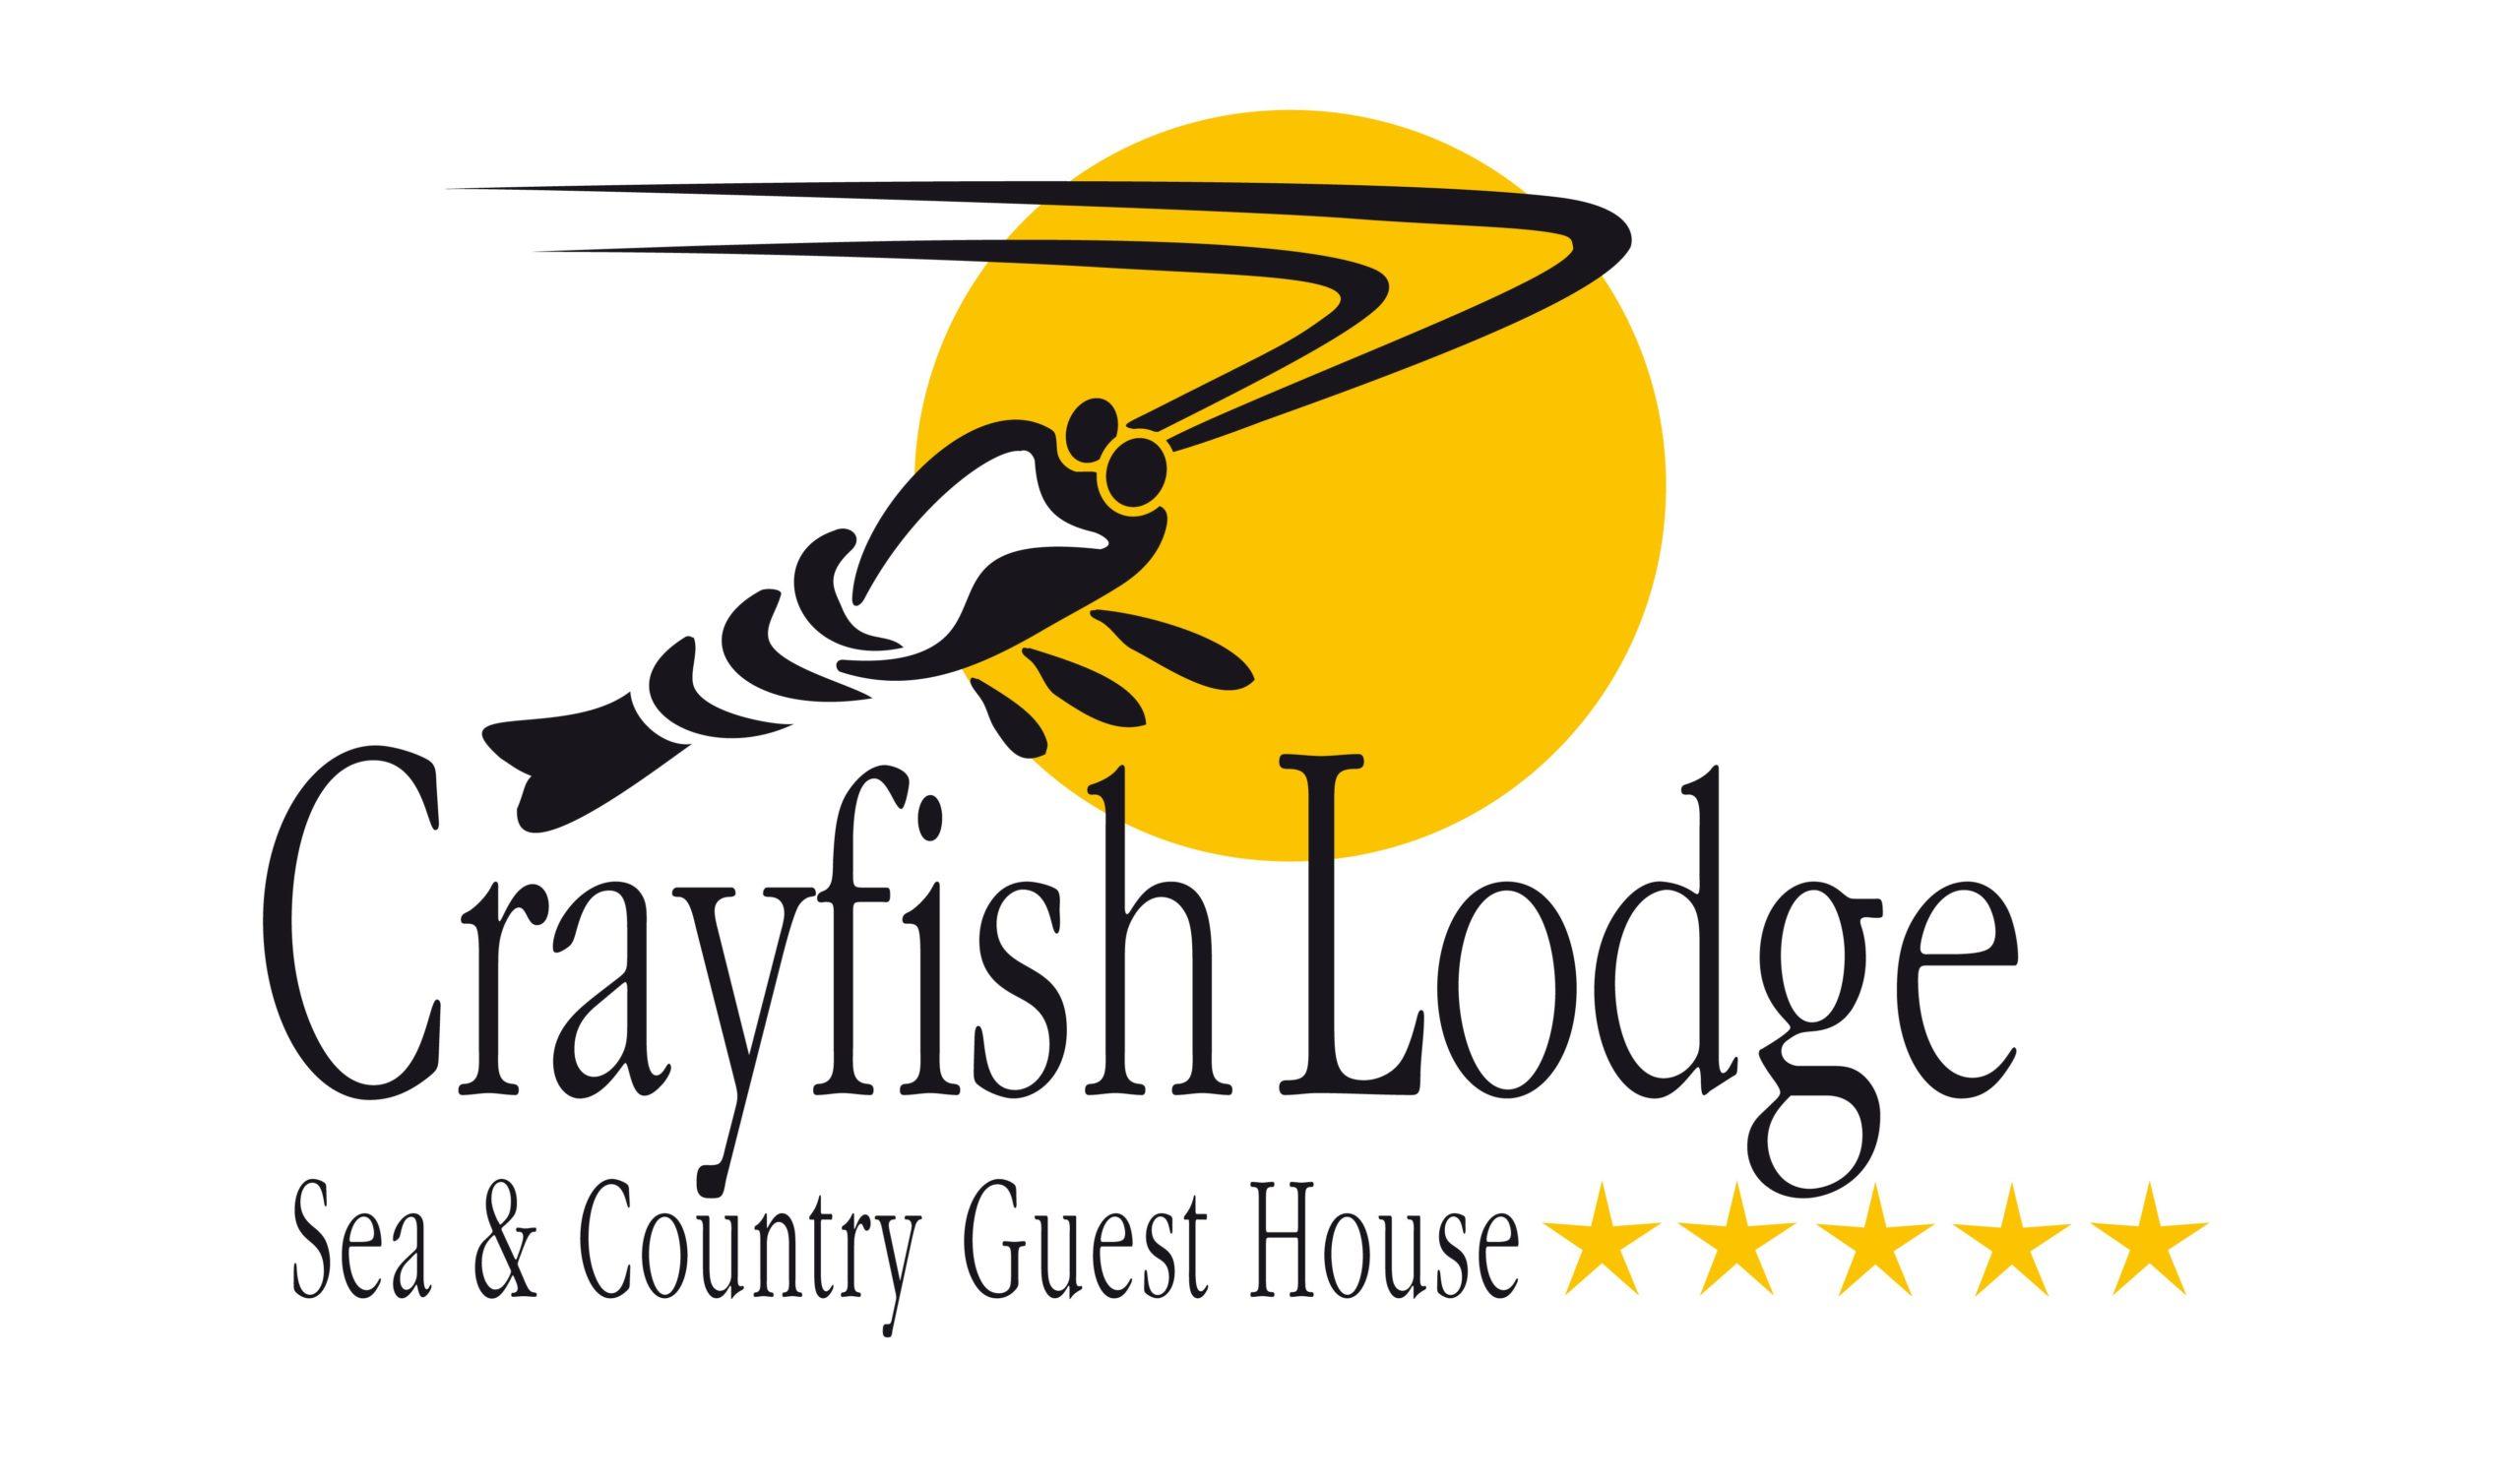 Crayfish Lodge